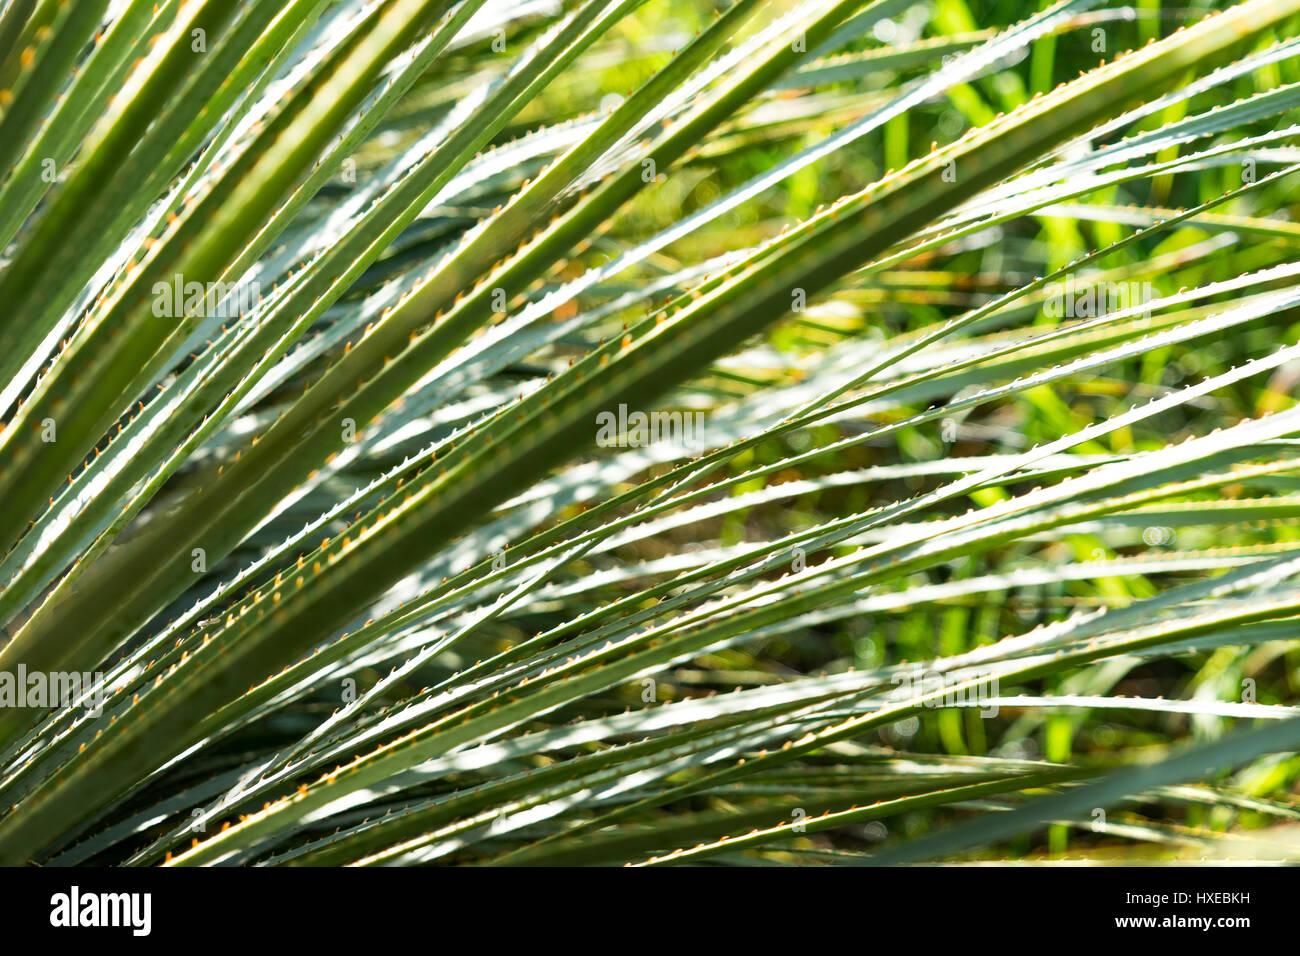 Backlit green sawgrass in Tucson, Arizona - Stock Image